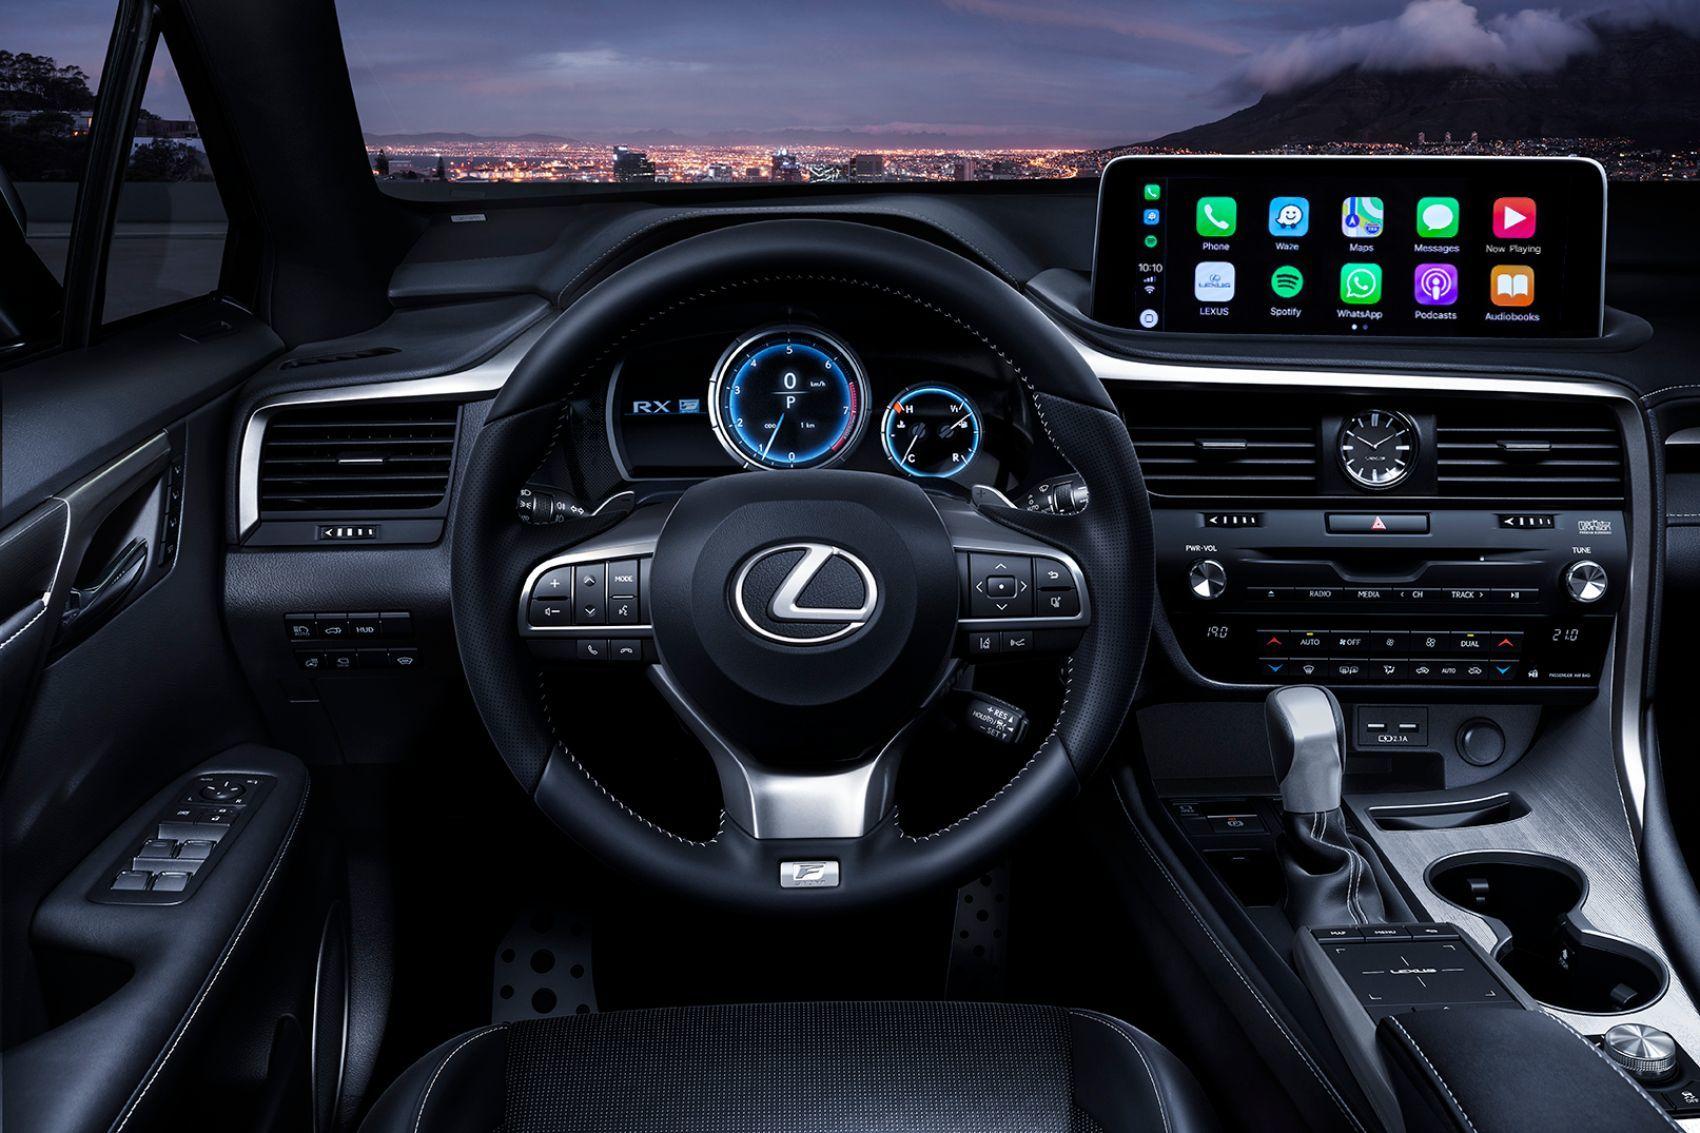 2022 Lexus Rx 350 F Sport Suv Spy Shots